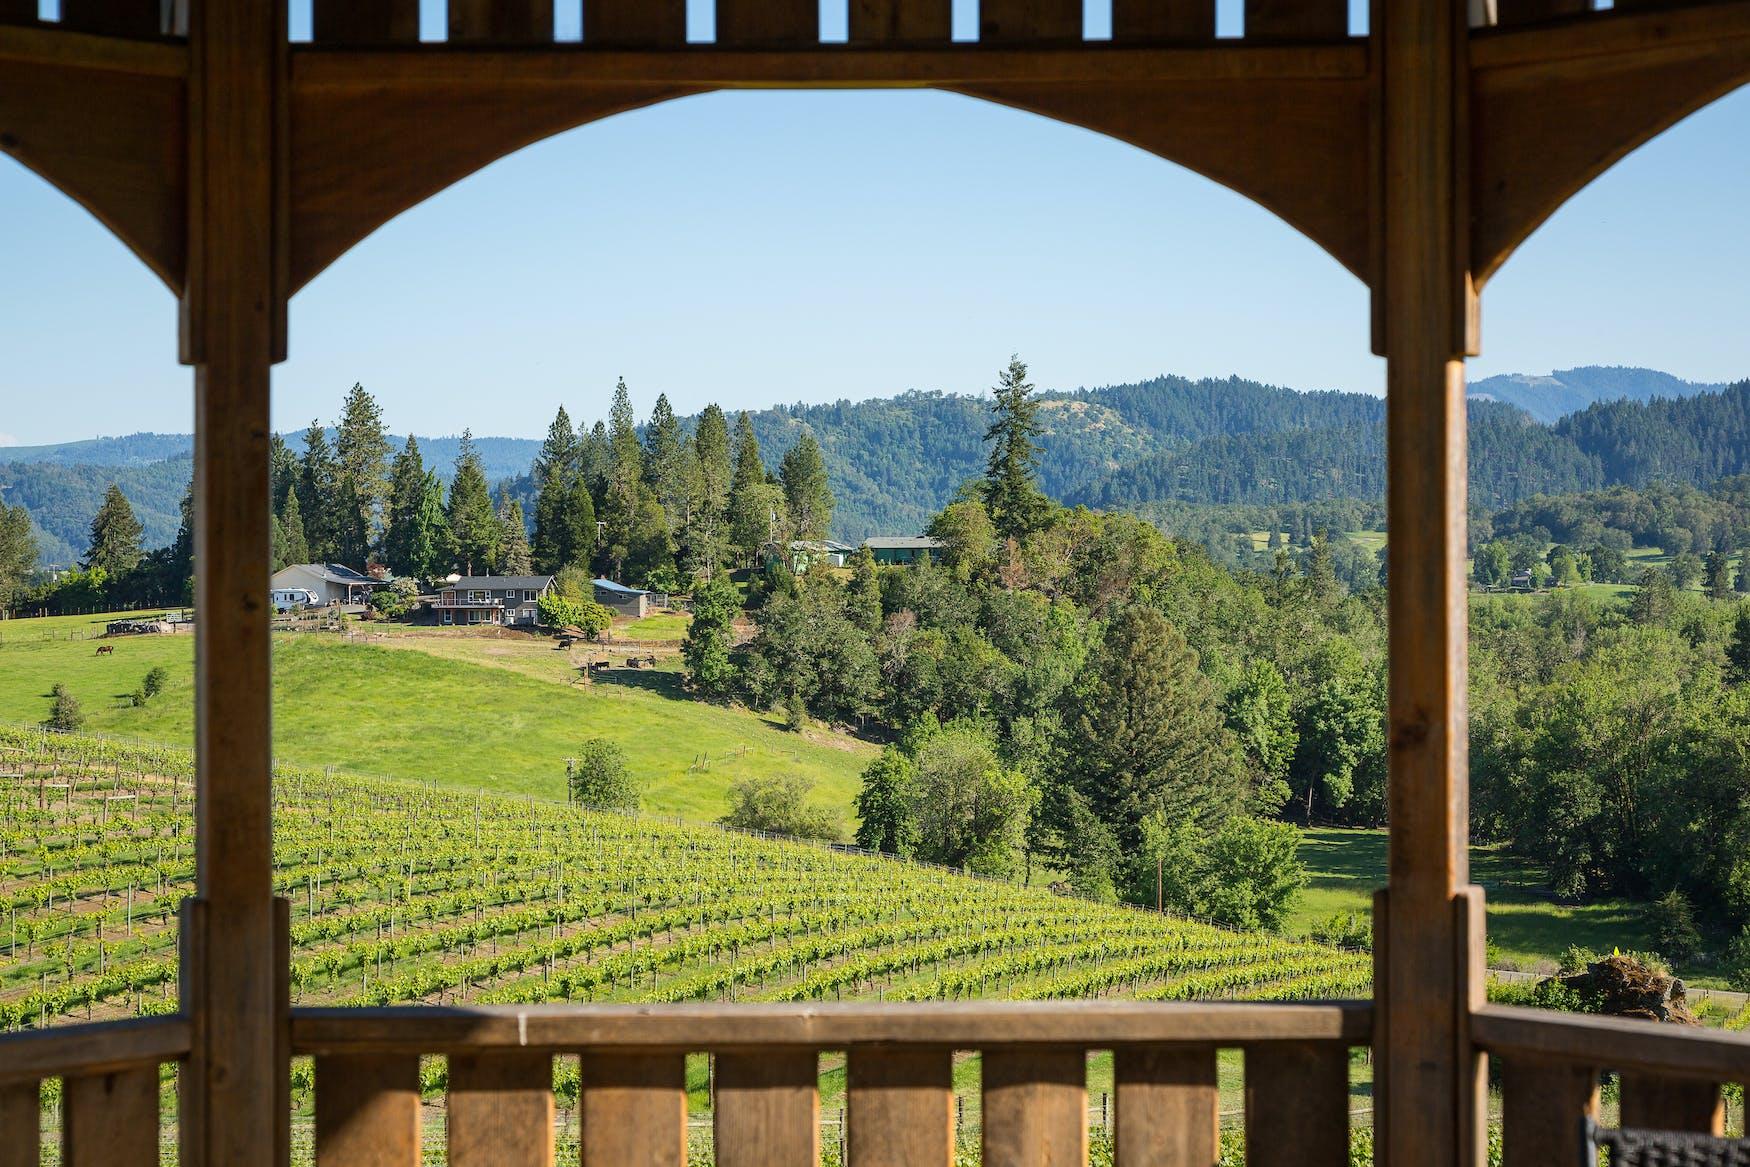 Umpqua Valley Wine Trail